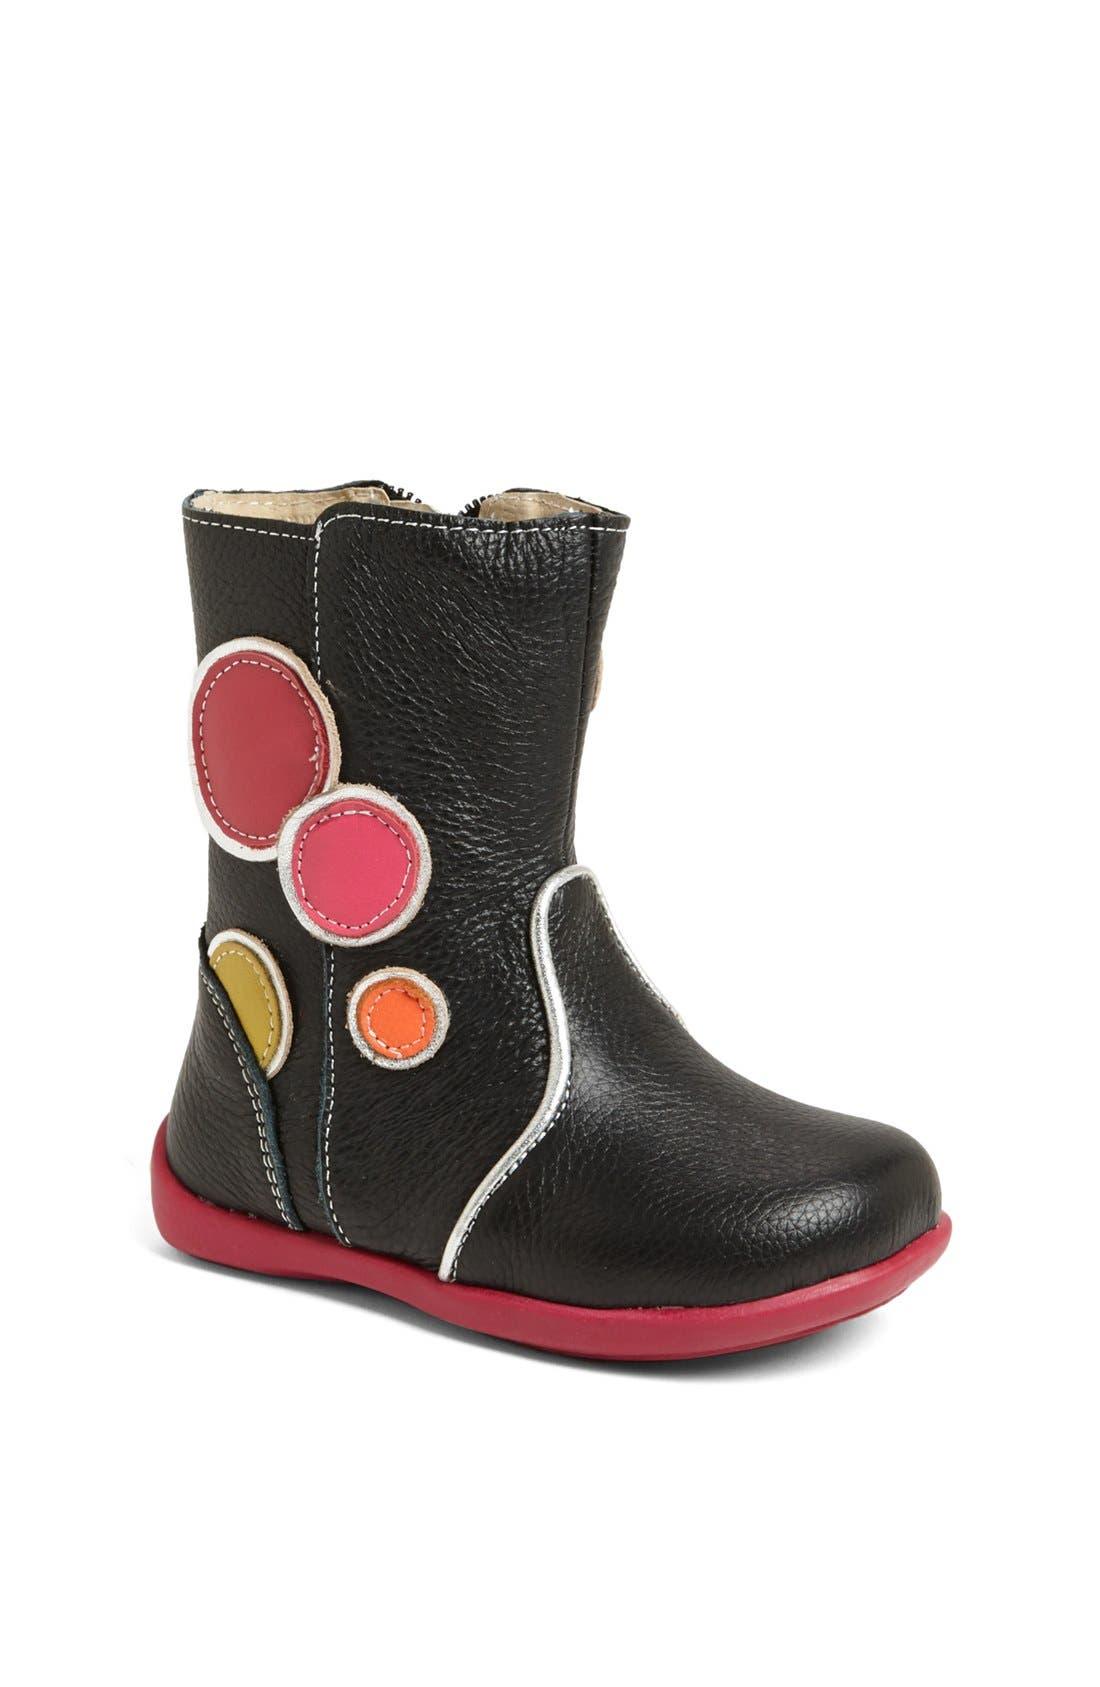 Alternate Image 1 Selected - See Kai Run 'Lena' Boot (Toddler & Little Kid)